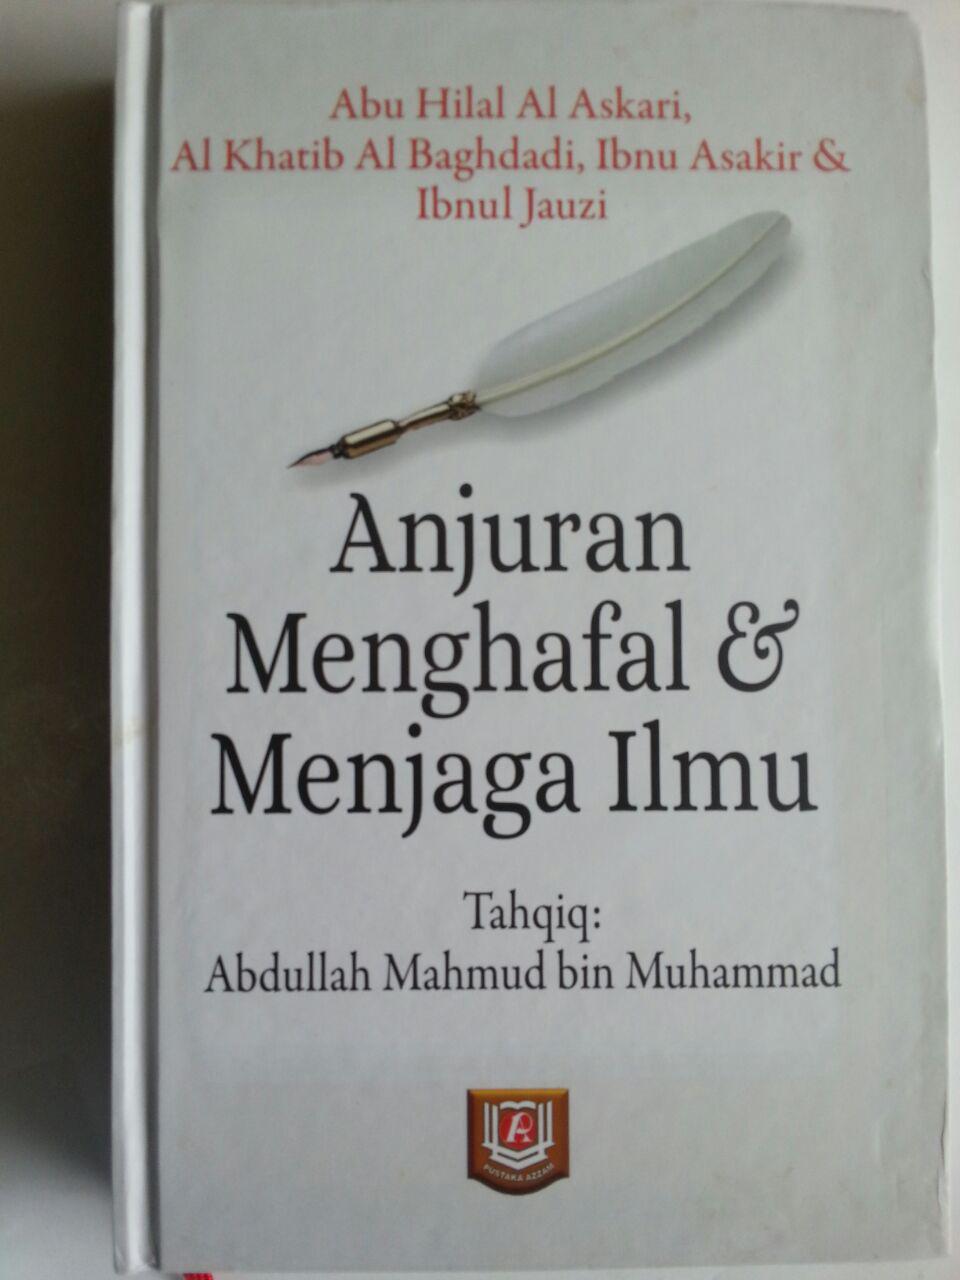 Buku Anjuran Menghafal Dan Menjaga Ilmu cover 2